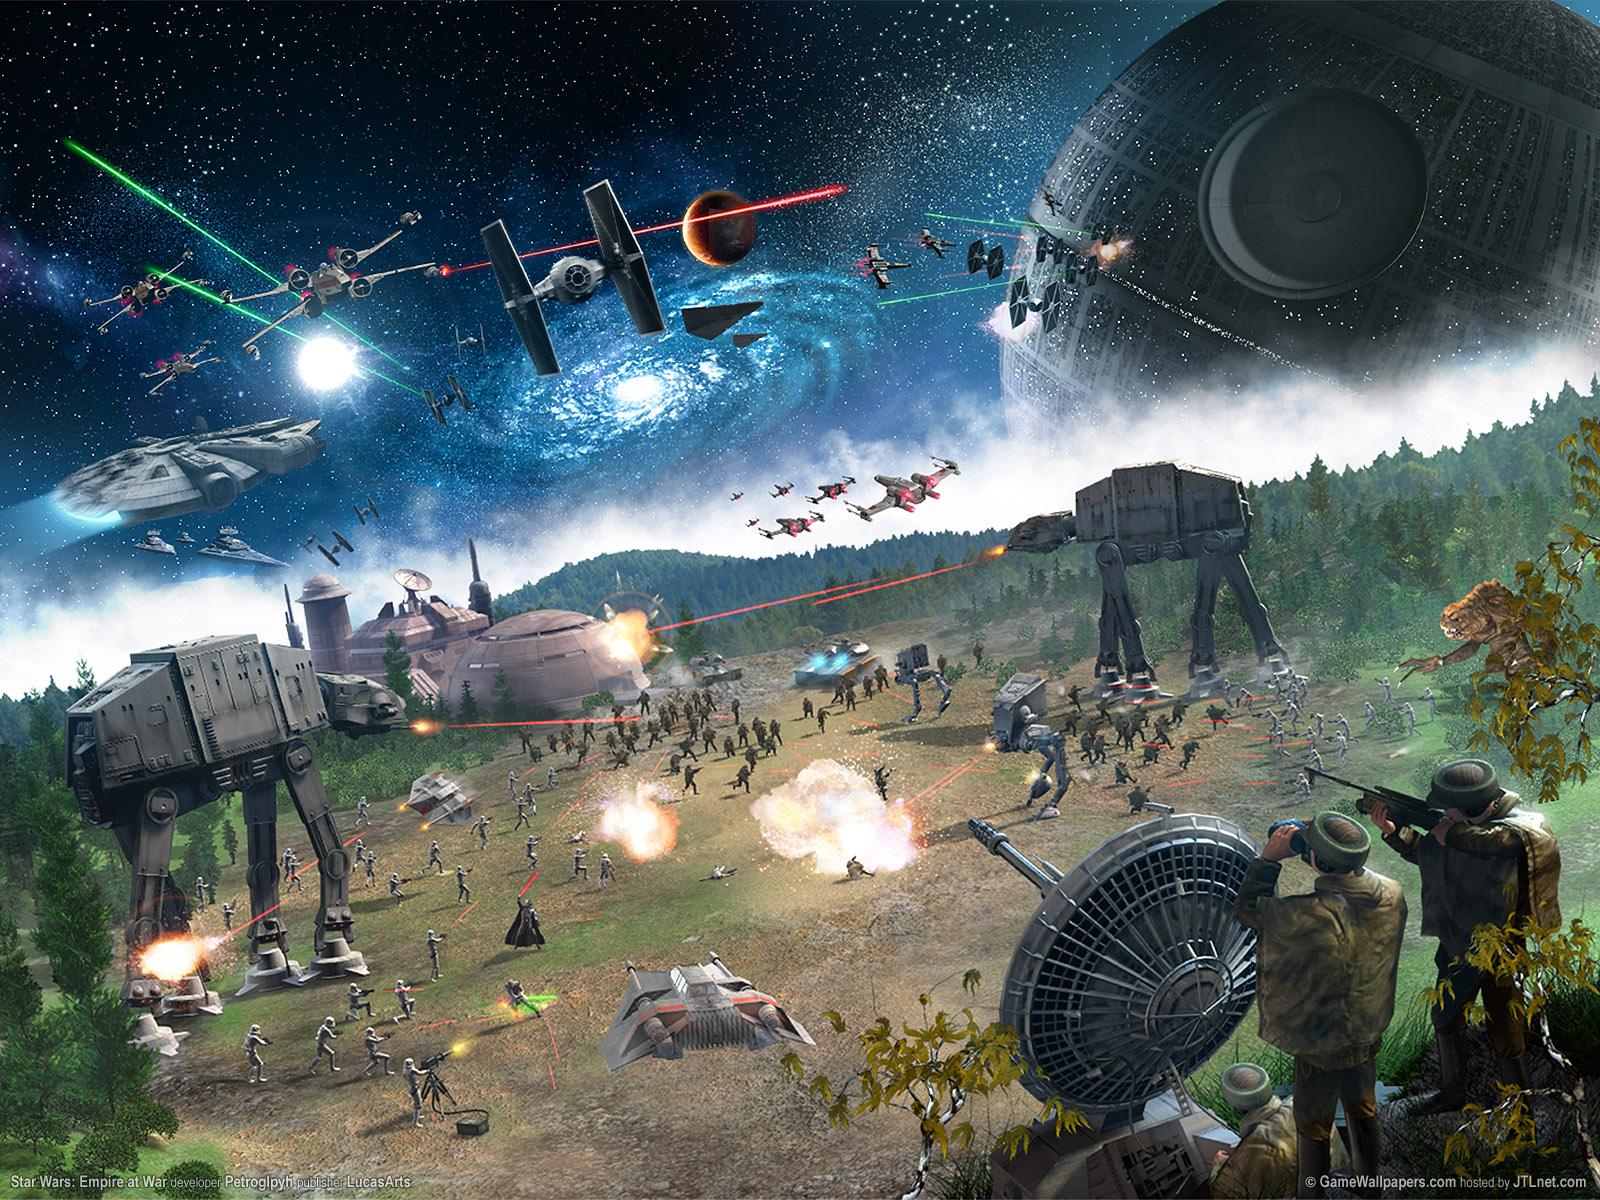 Star Wars Battle Scene Wallpaper and Background Image 1600x1200 1600x1200